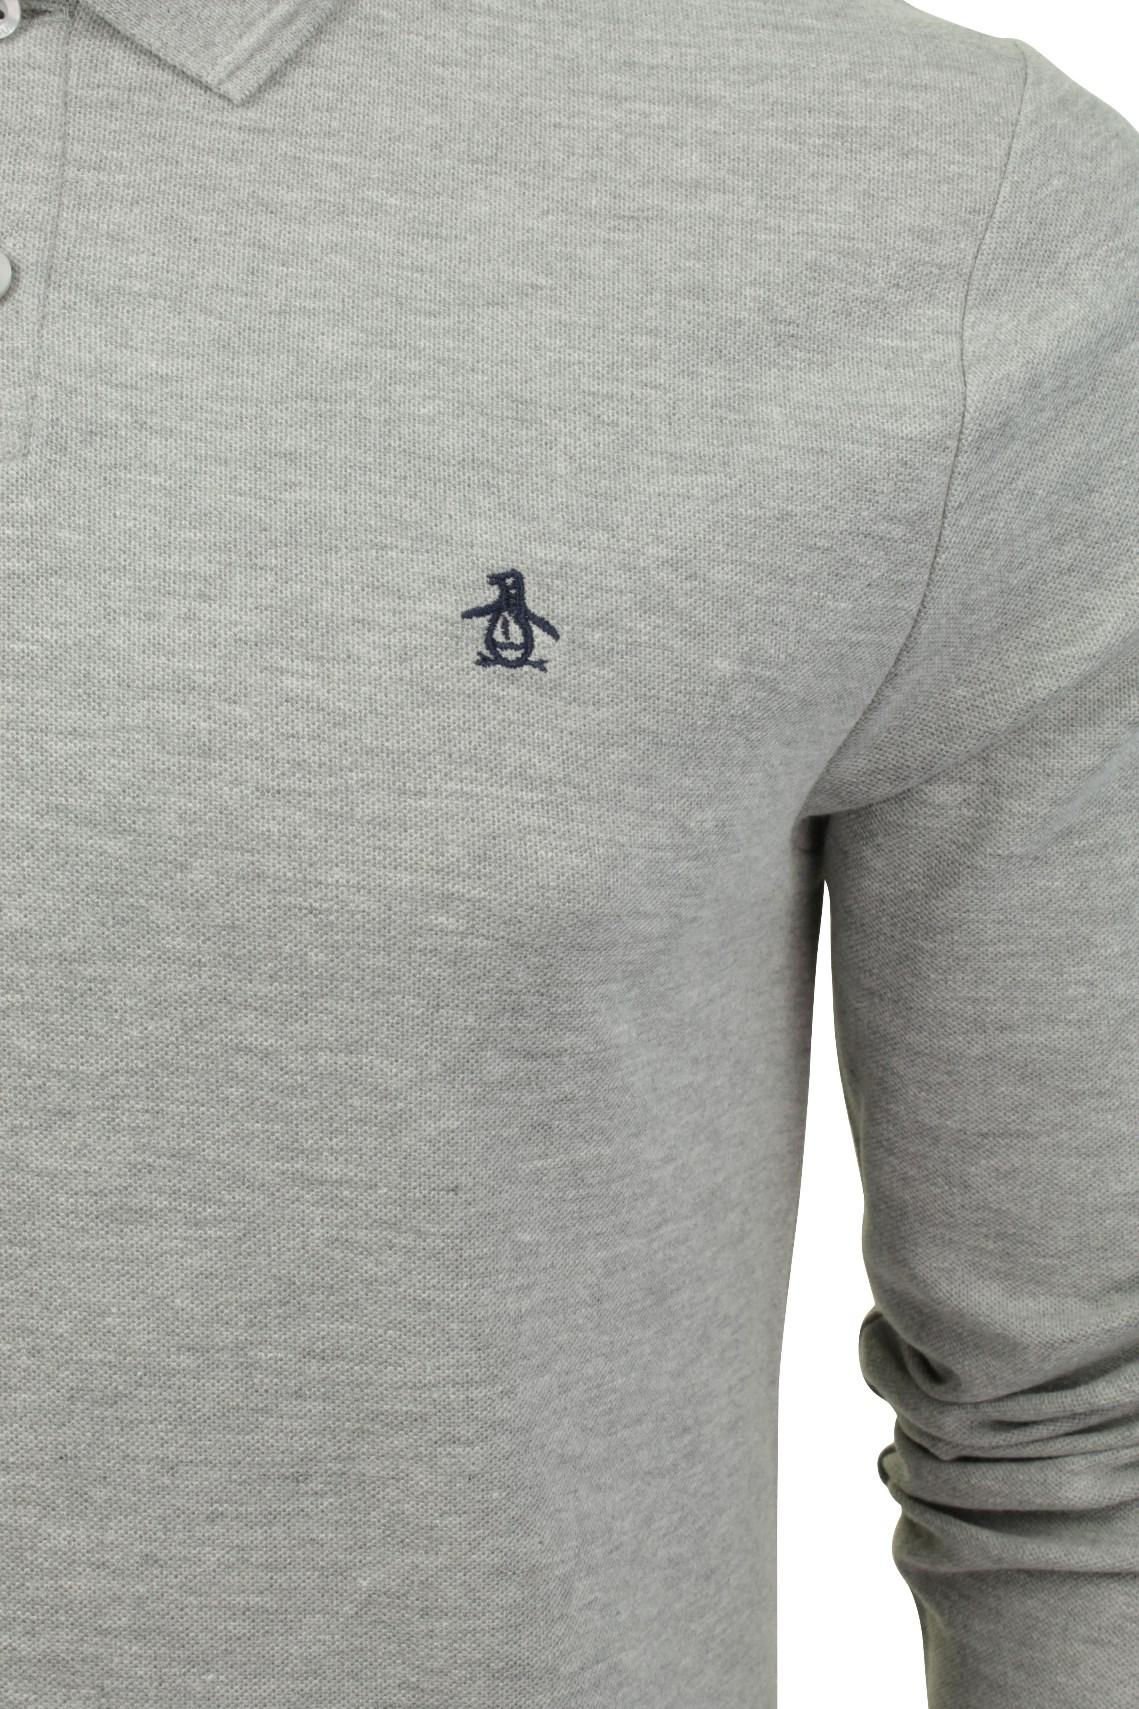 Mens-Polo-T-Shirt-by-Original-Penguin-039-Winston-039-Long-Sleeved thumbnail 7